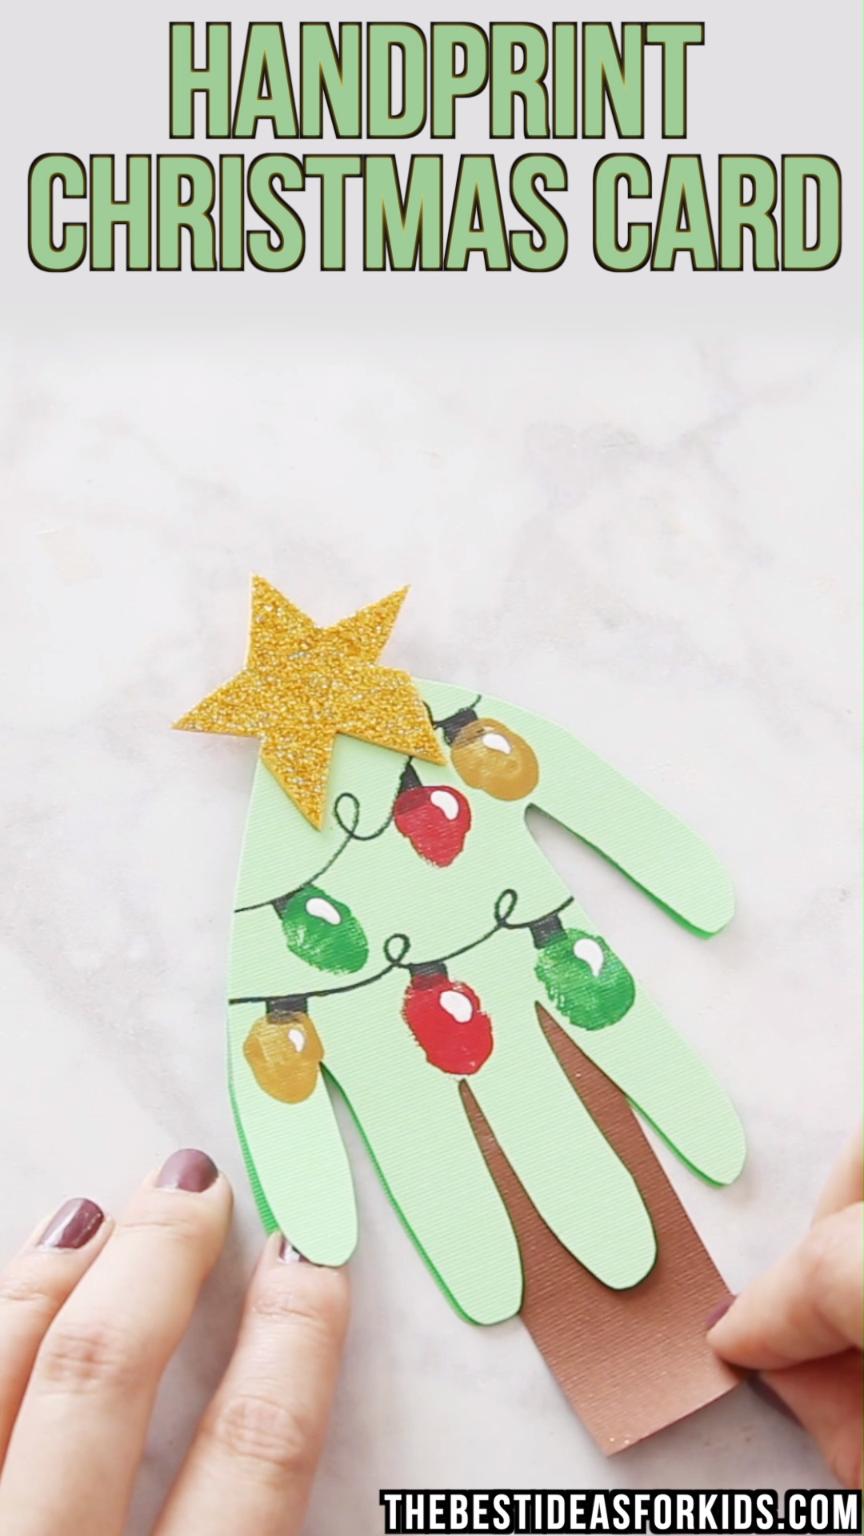 Handprint Christmas Card - Handprint Christmas Tree Card | Christmas ...